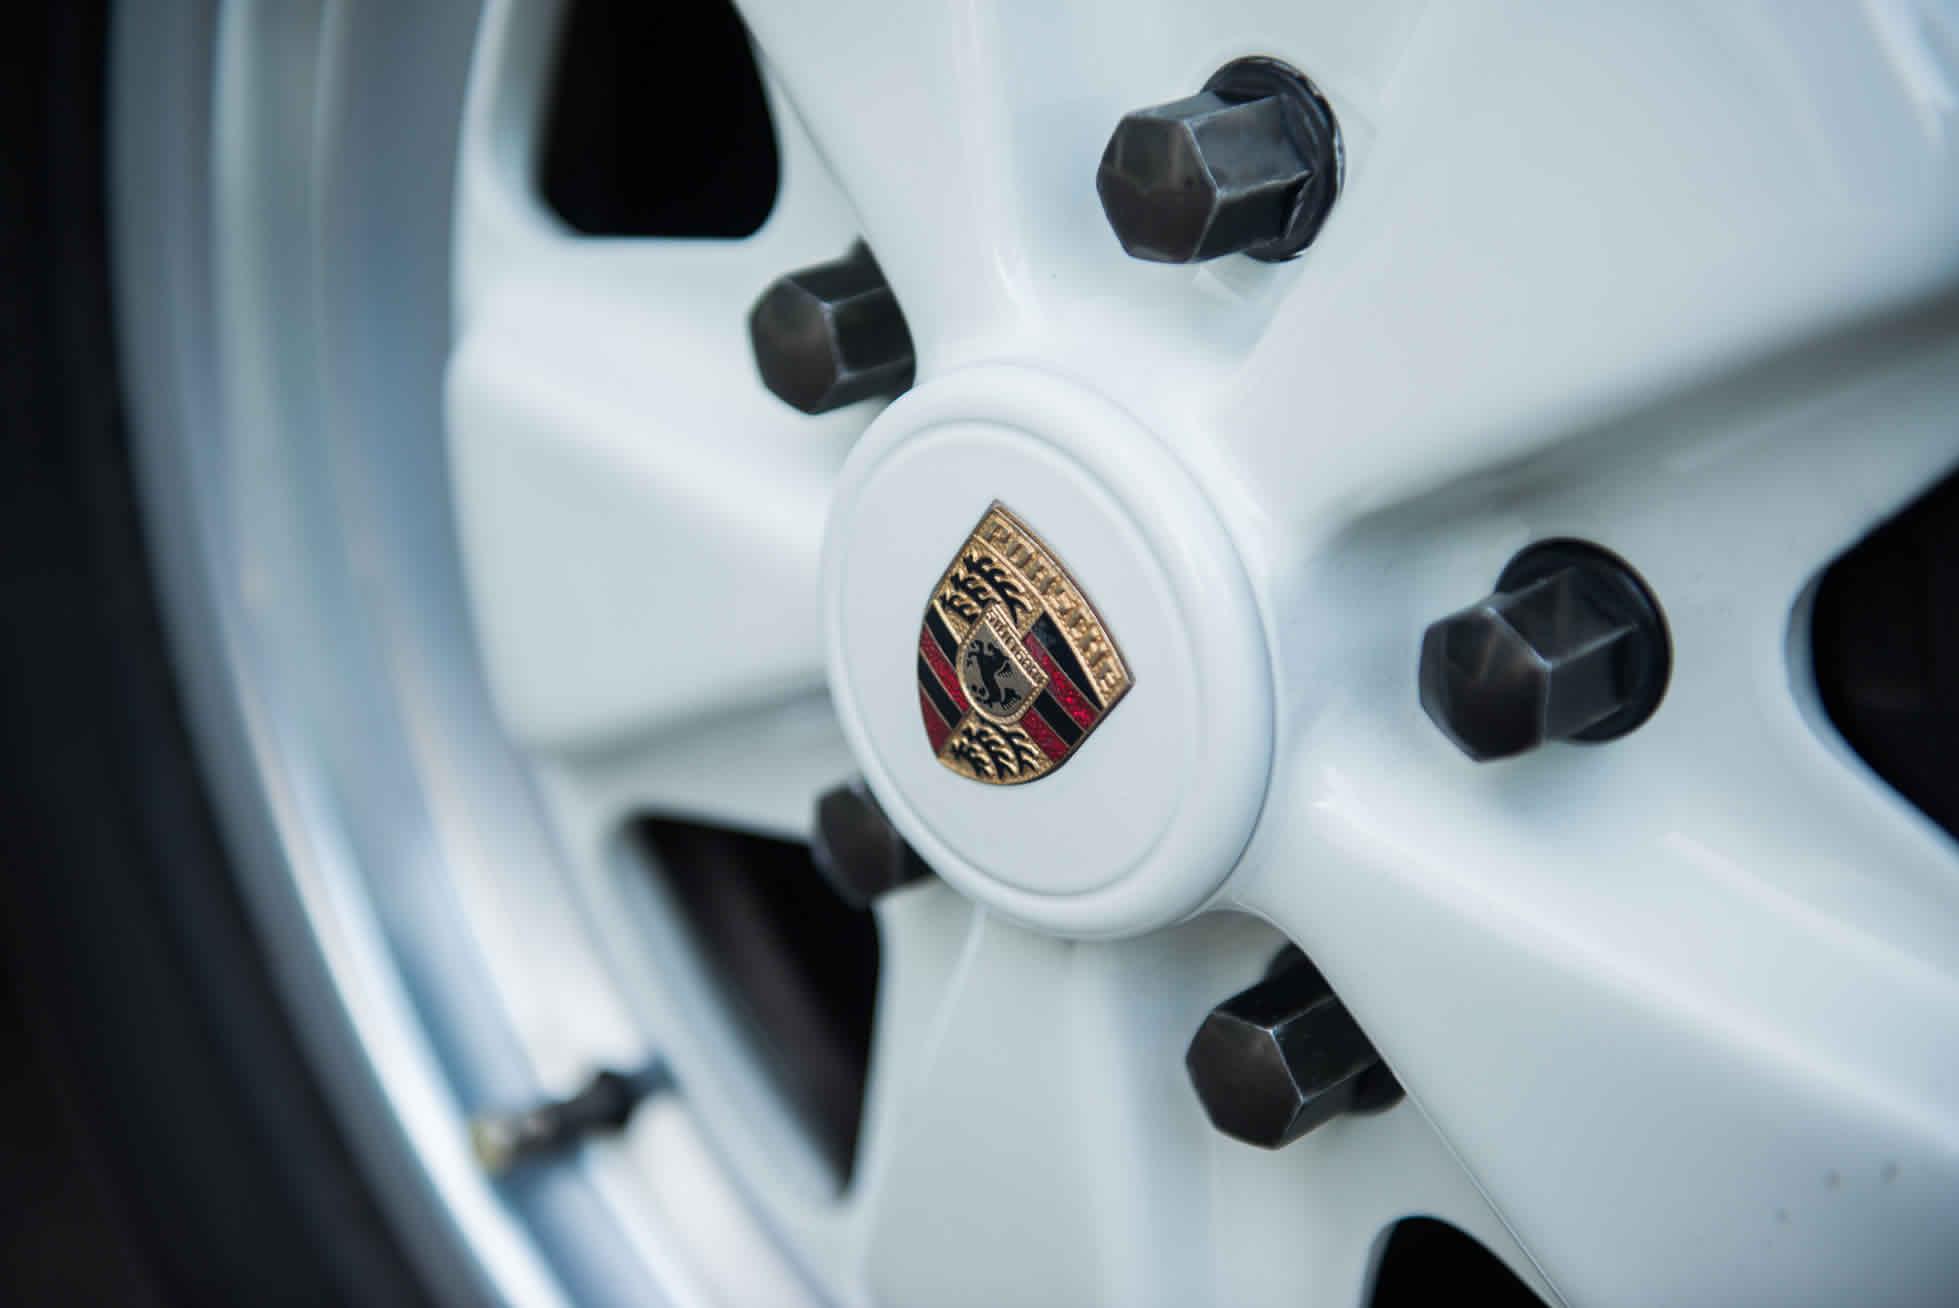 For Sale 1989 Porsche 3.2 Carrera Club Sport wheels